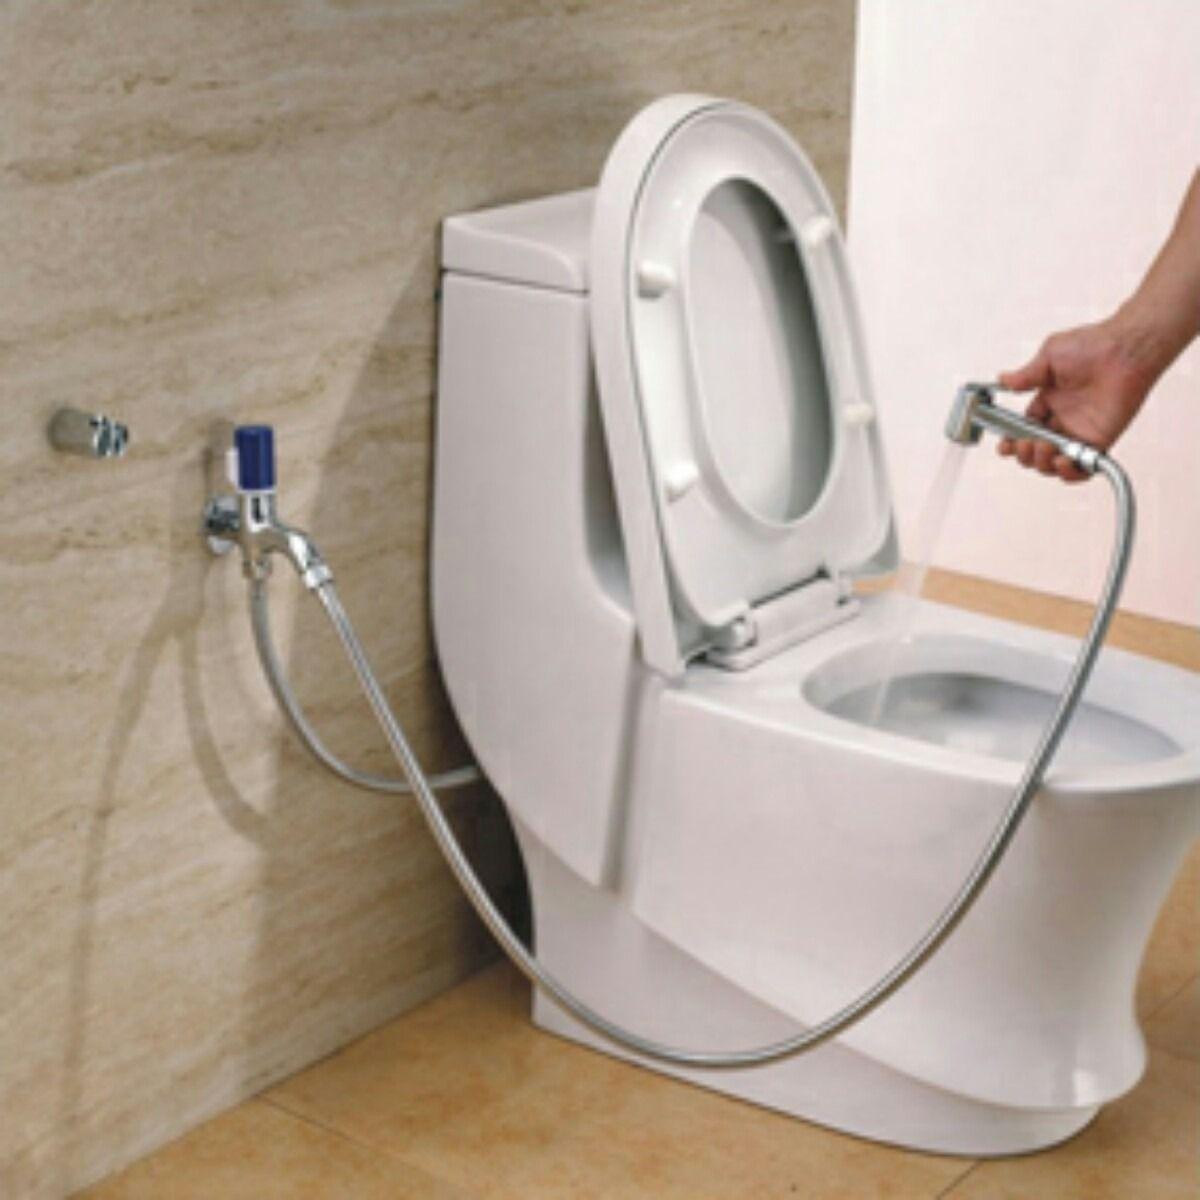 Grifo Inodoro Bidet Ducha Higienica Leroy Merlin Buscar Con Google Bathroom Redesign Bathroom Remodel Shower Smart Toilet